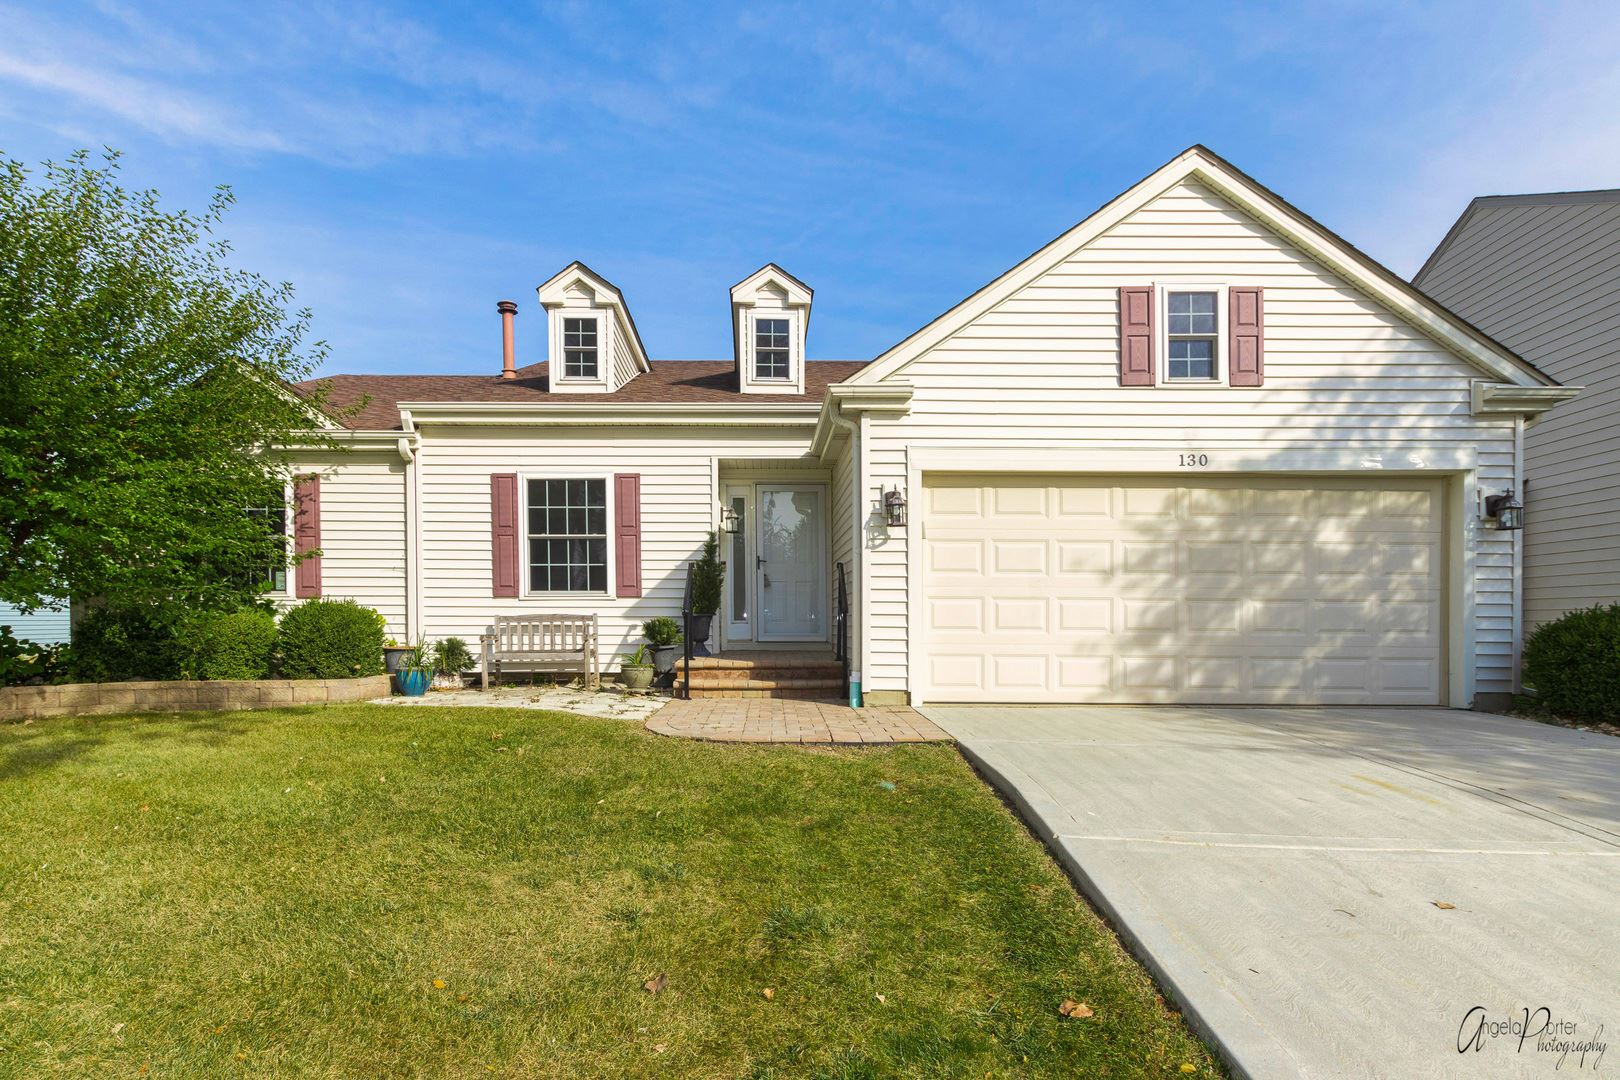 130 Jefferson Lane, Streamwood, IL 60107 - #: 11201438